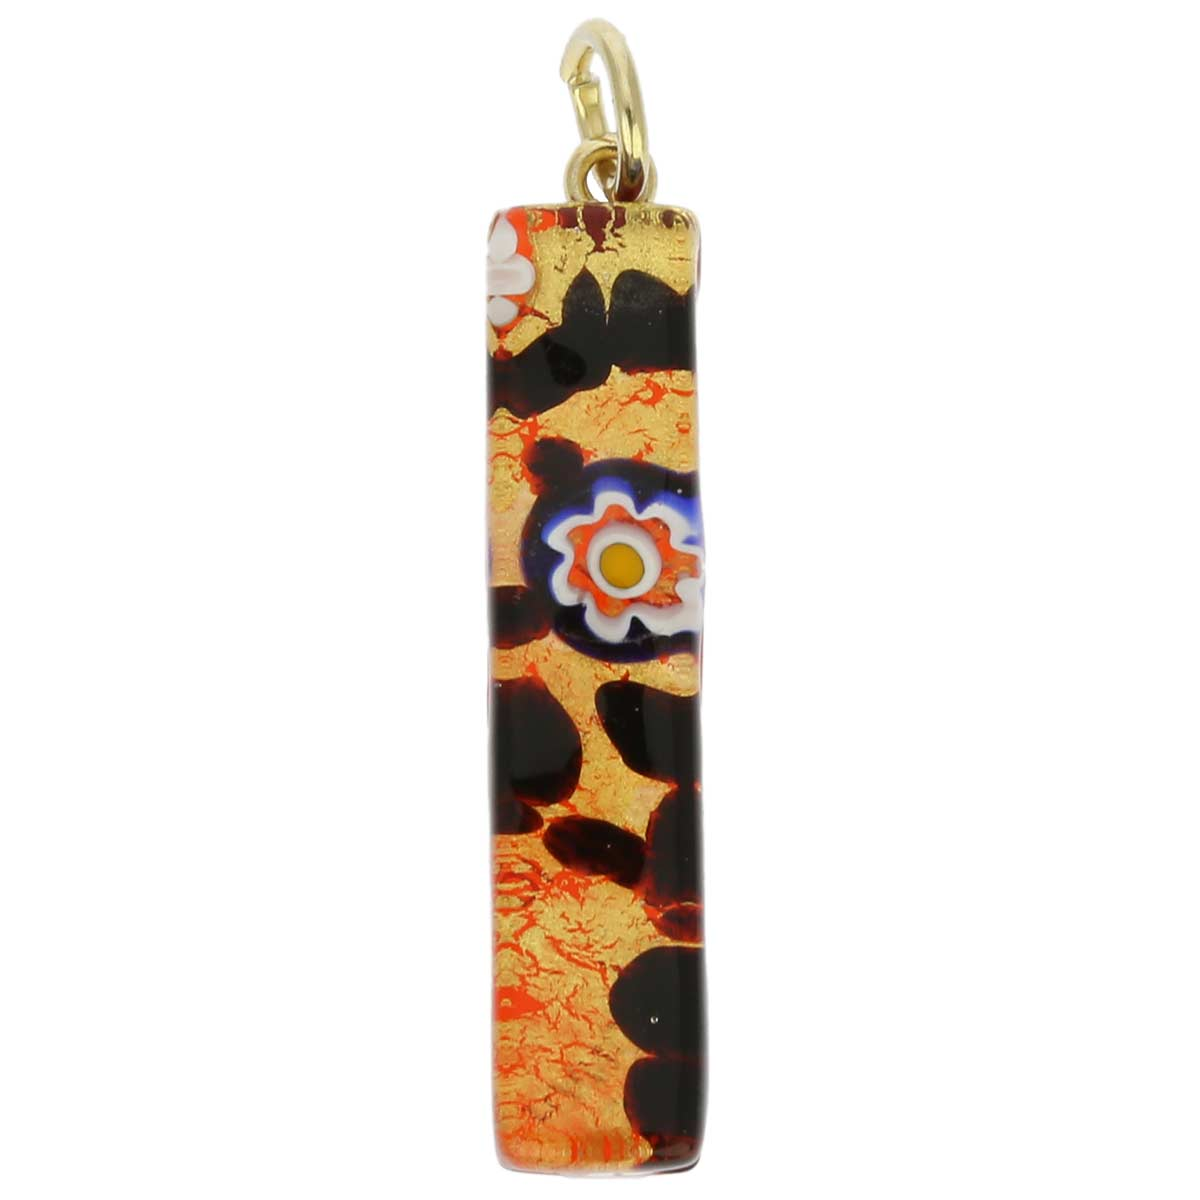 Venetian Reflections Stick Pendant - Gold Millefiori